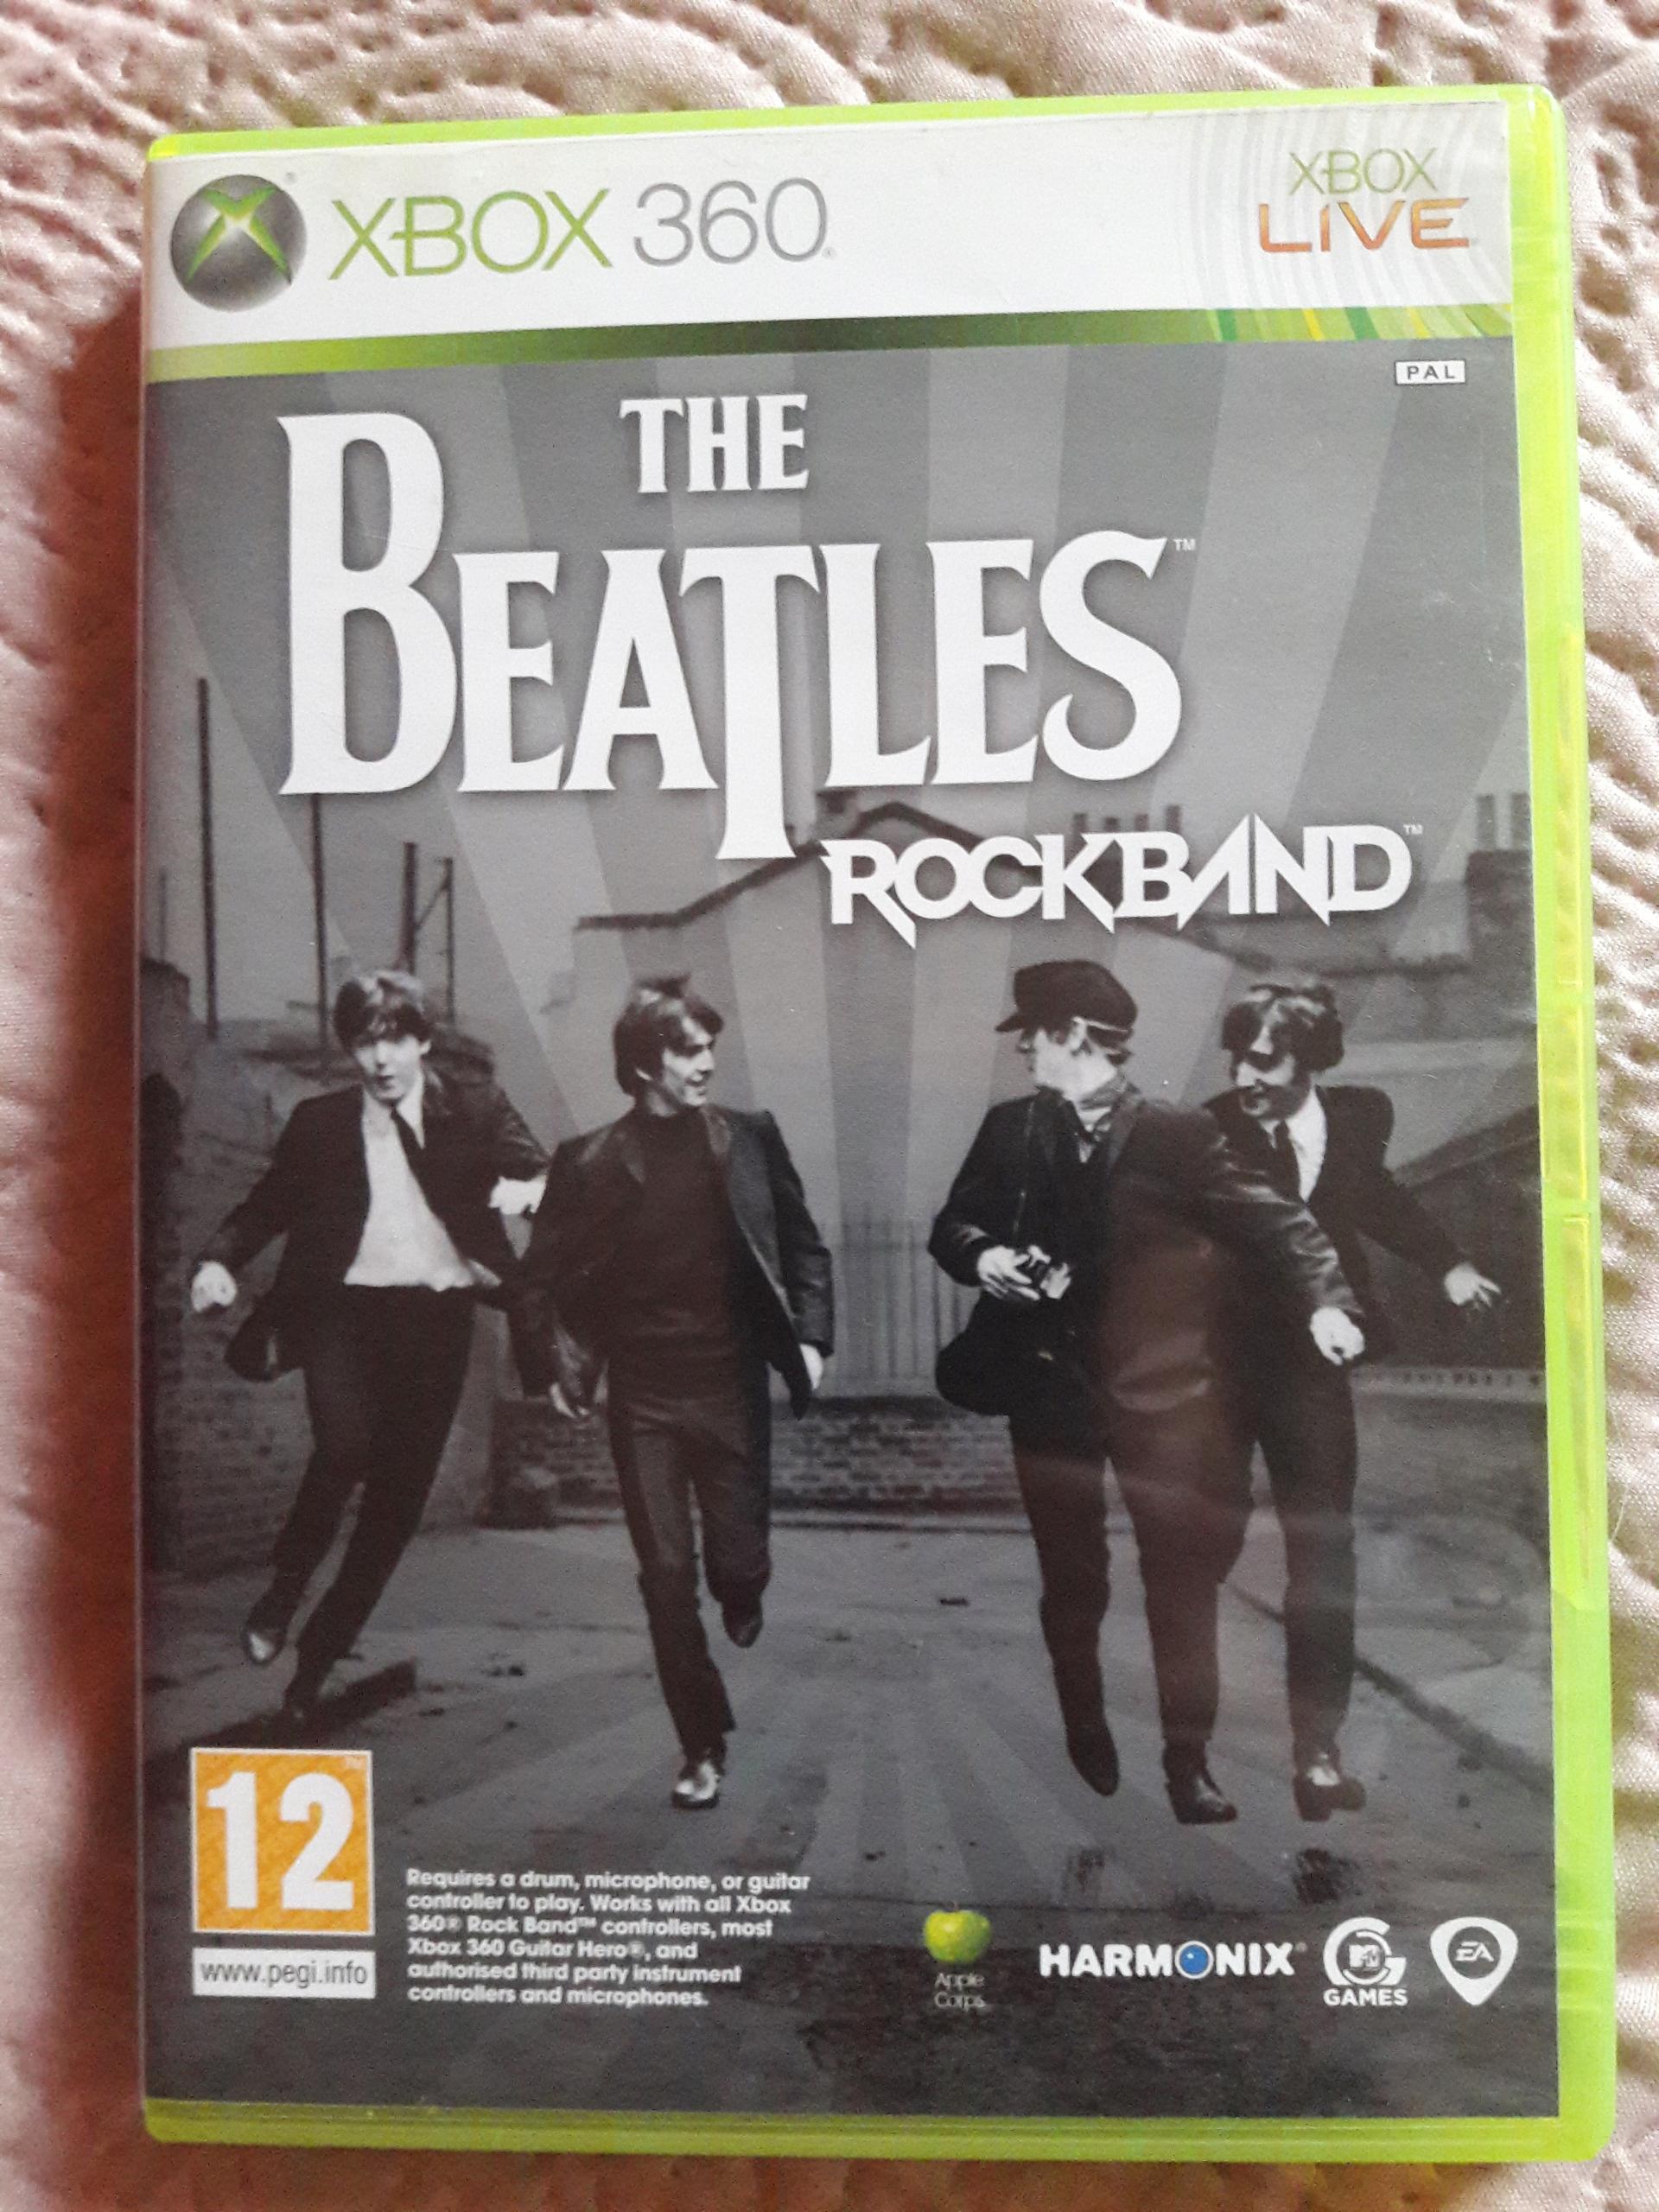 The Beatles Rockband XBOX 360